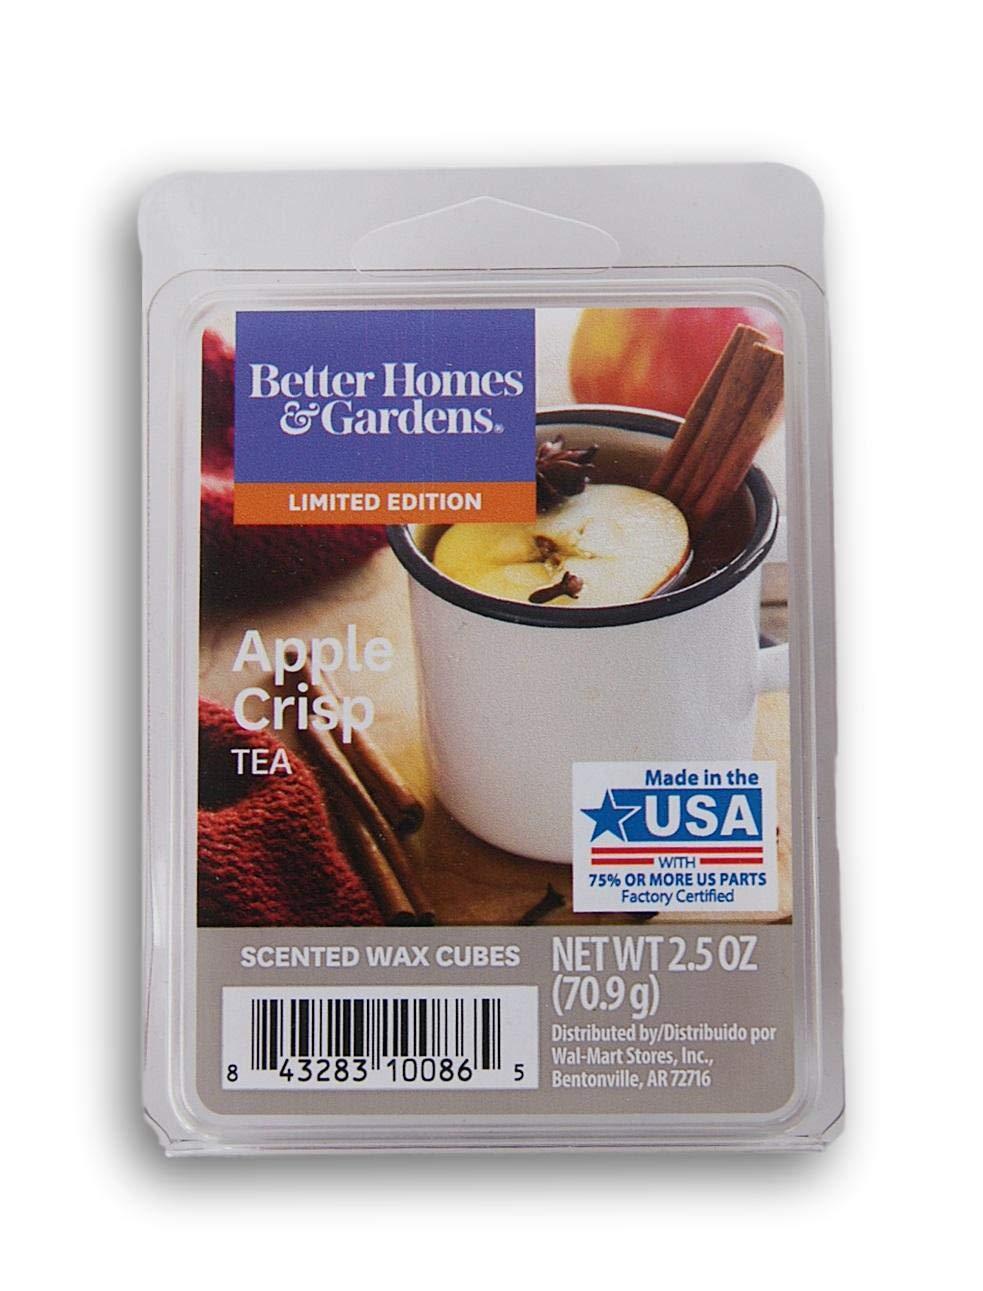 Better Homes /& Gardens Crisp Tea 2018 Limited Edition Wax Cubes Better Homes and Gardens